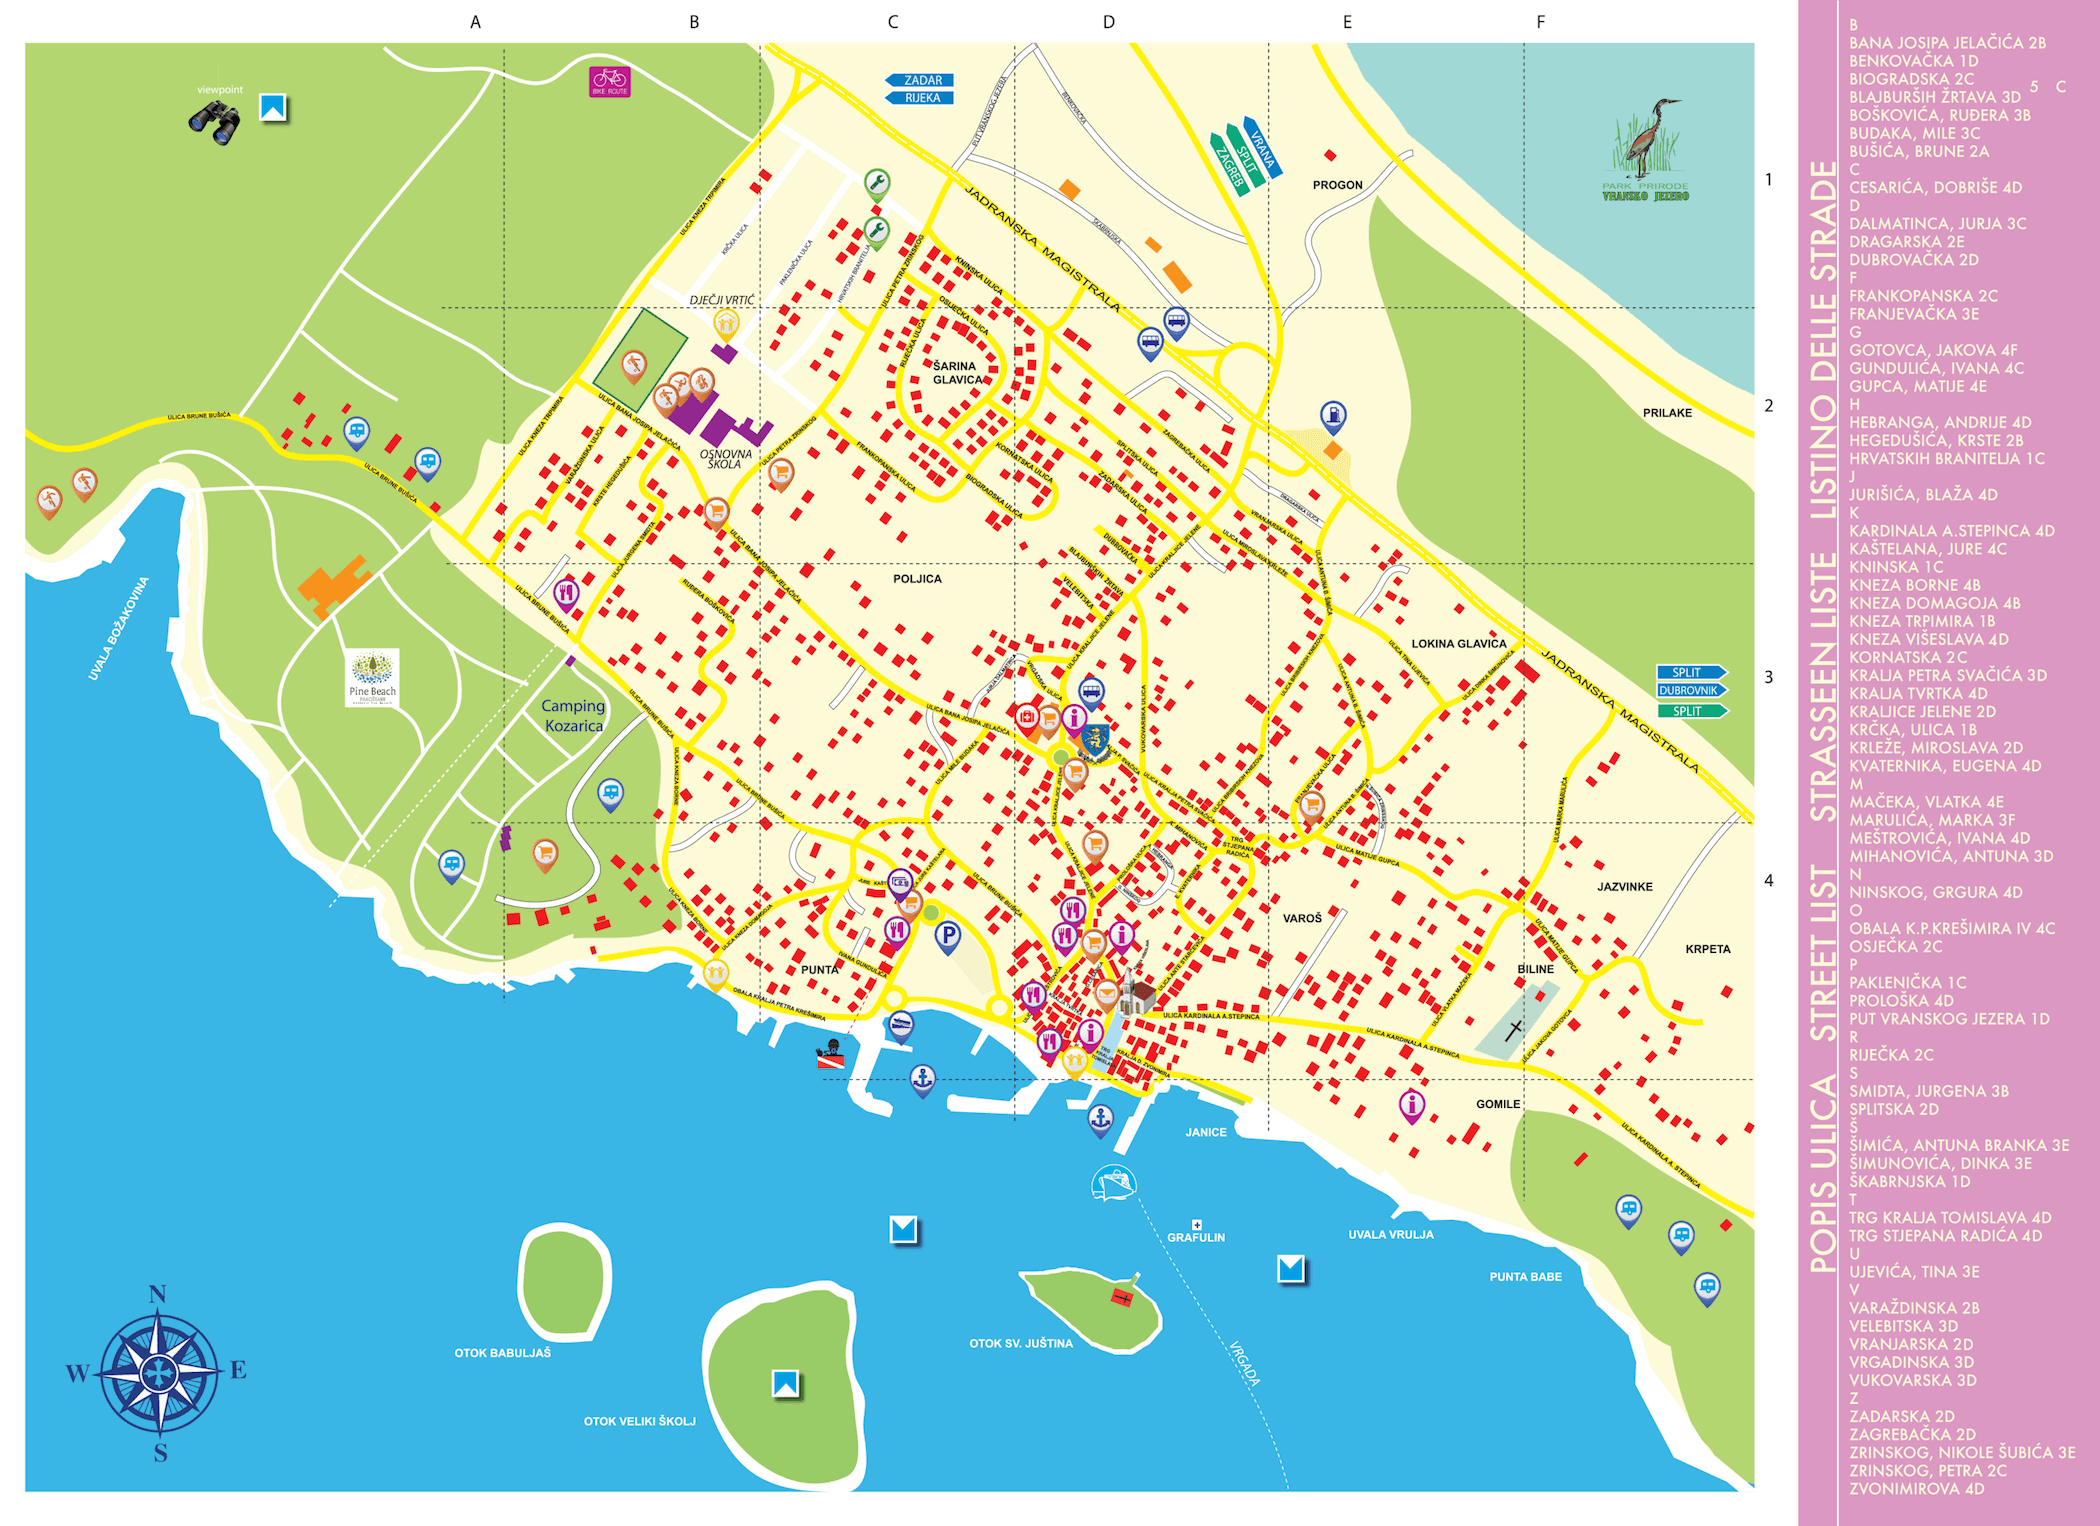 The plan places Pakostane